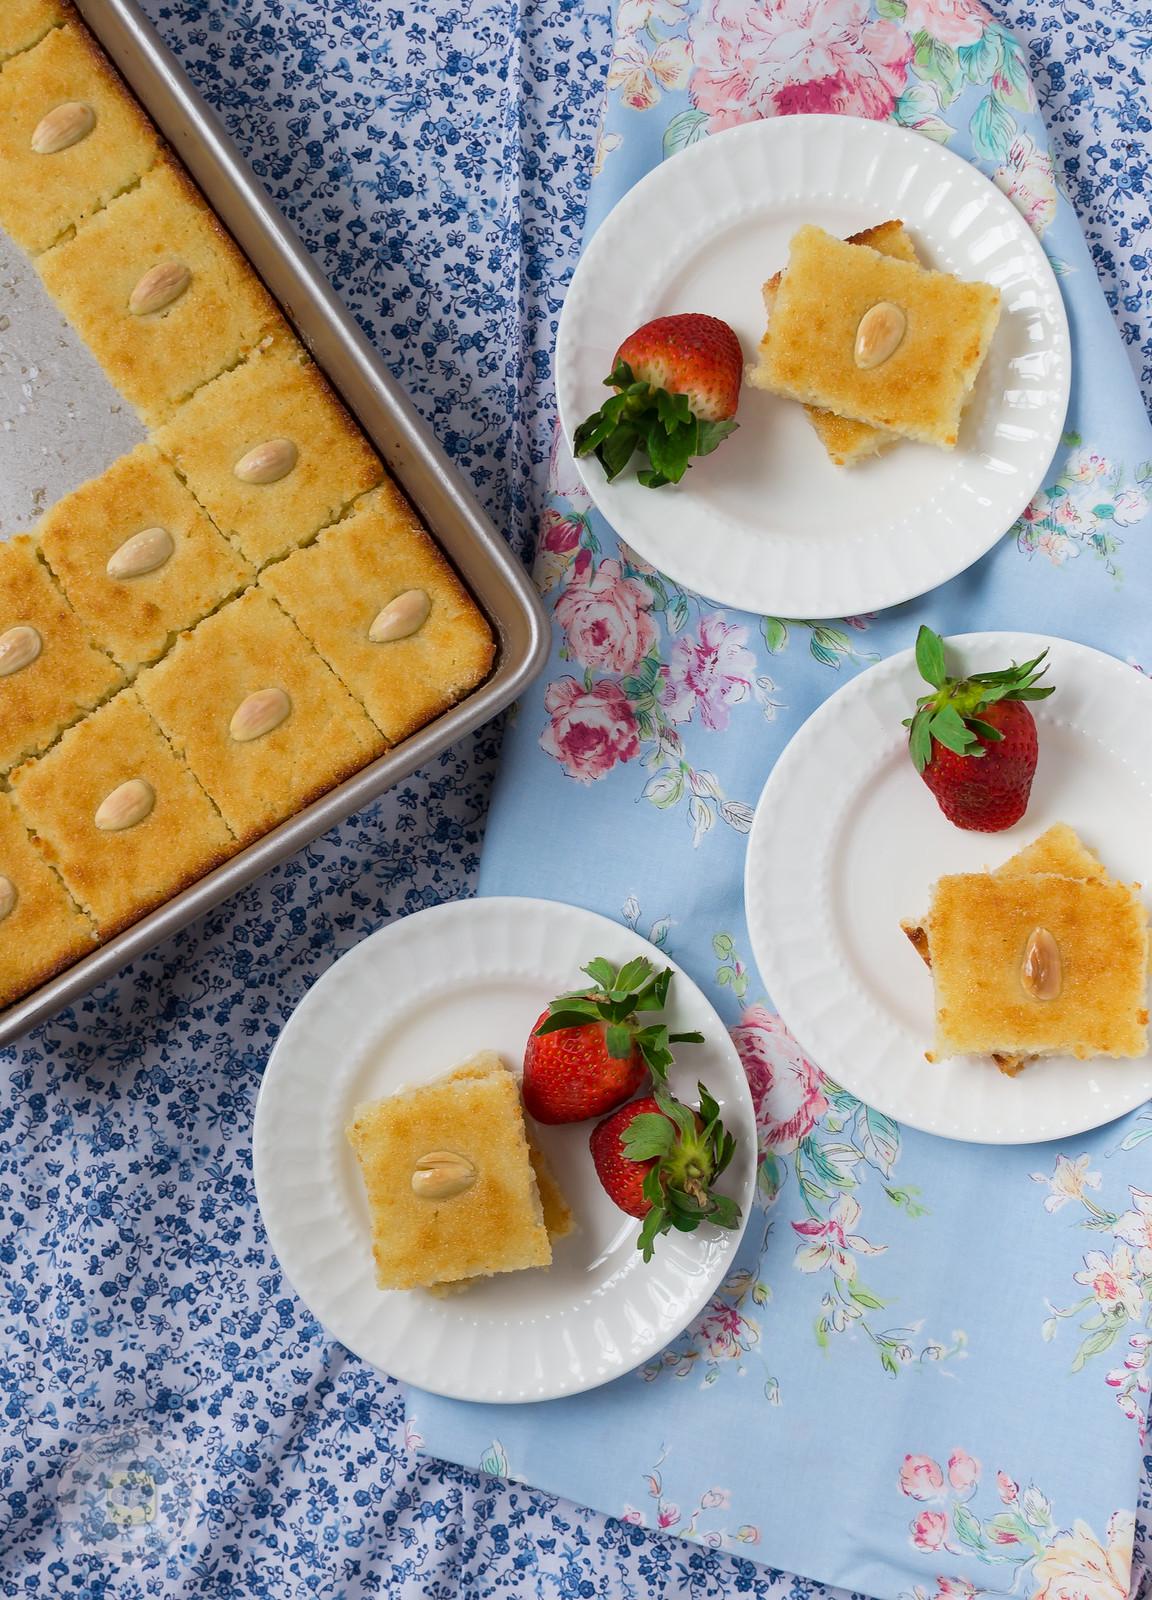 Rosewater and Orange Blossom Semolina Cake Final Top Shot